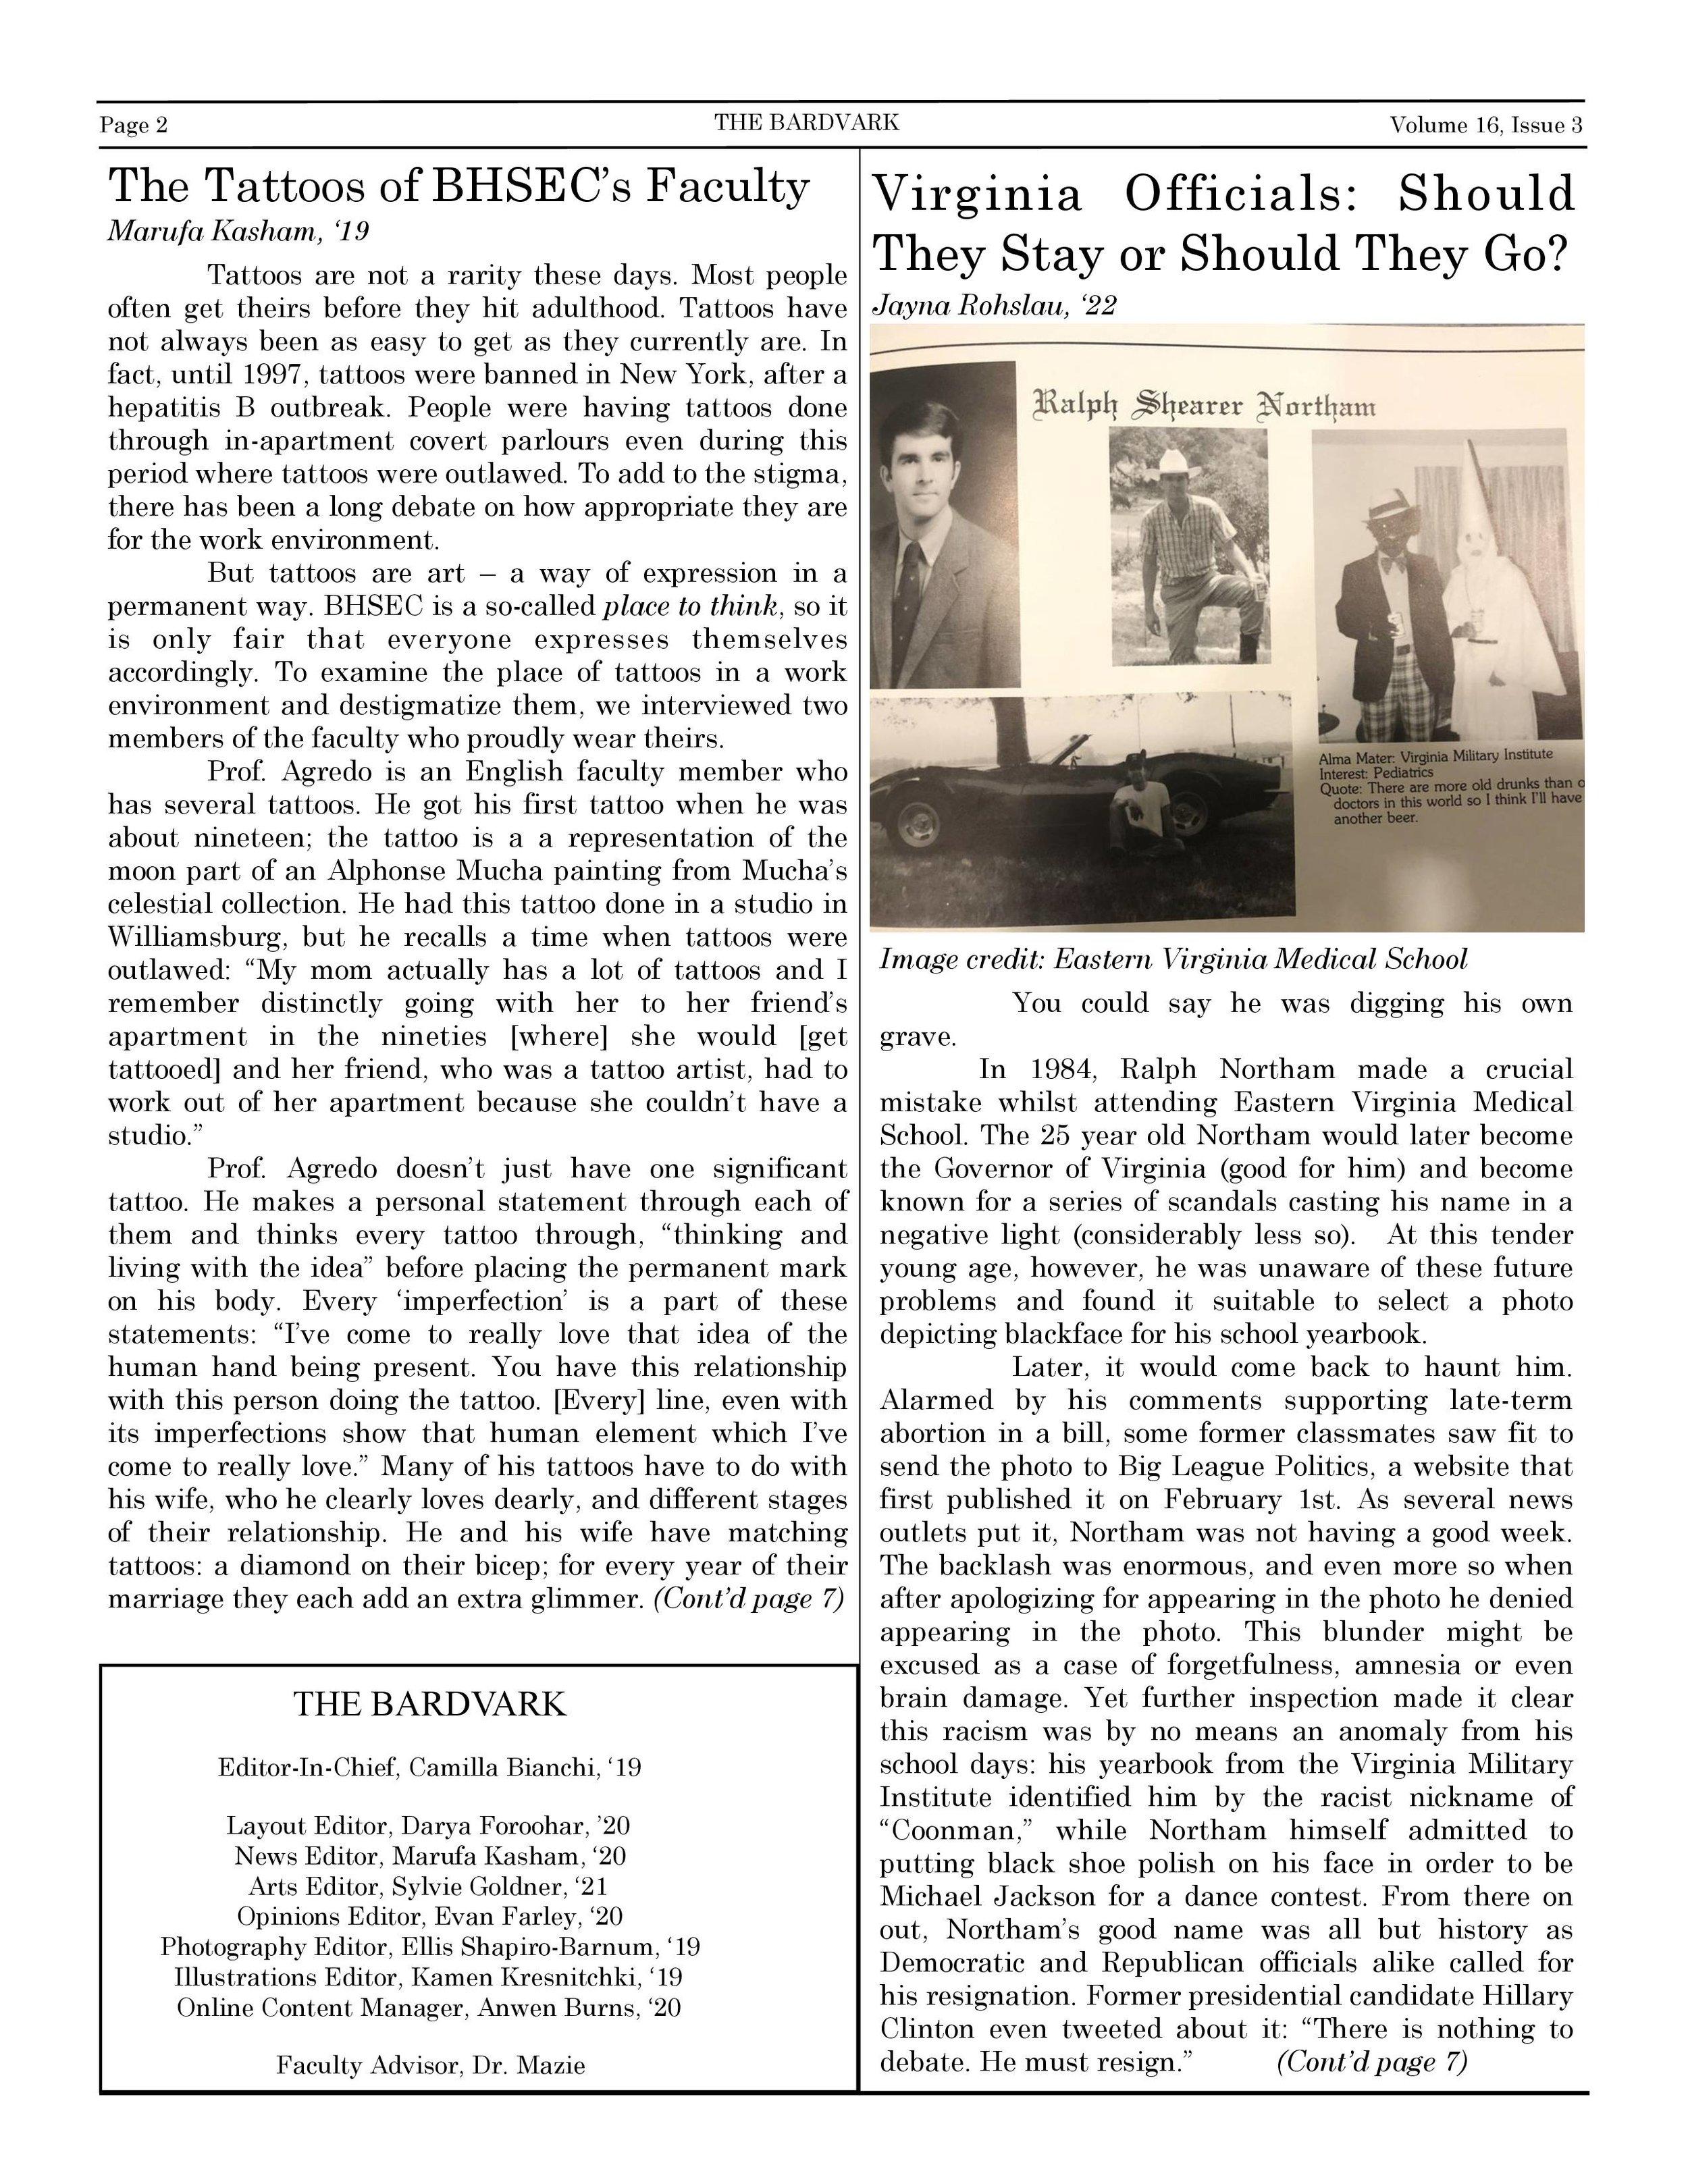 Issue 6 February 2019-2.jpg